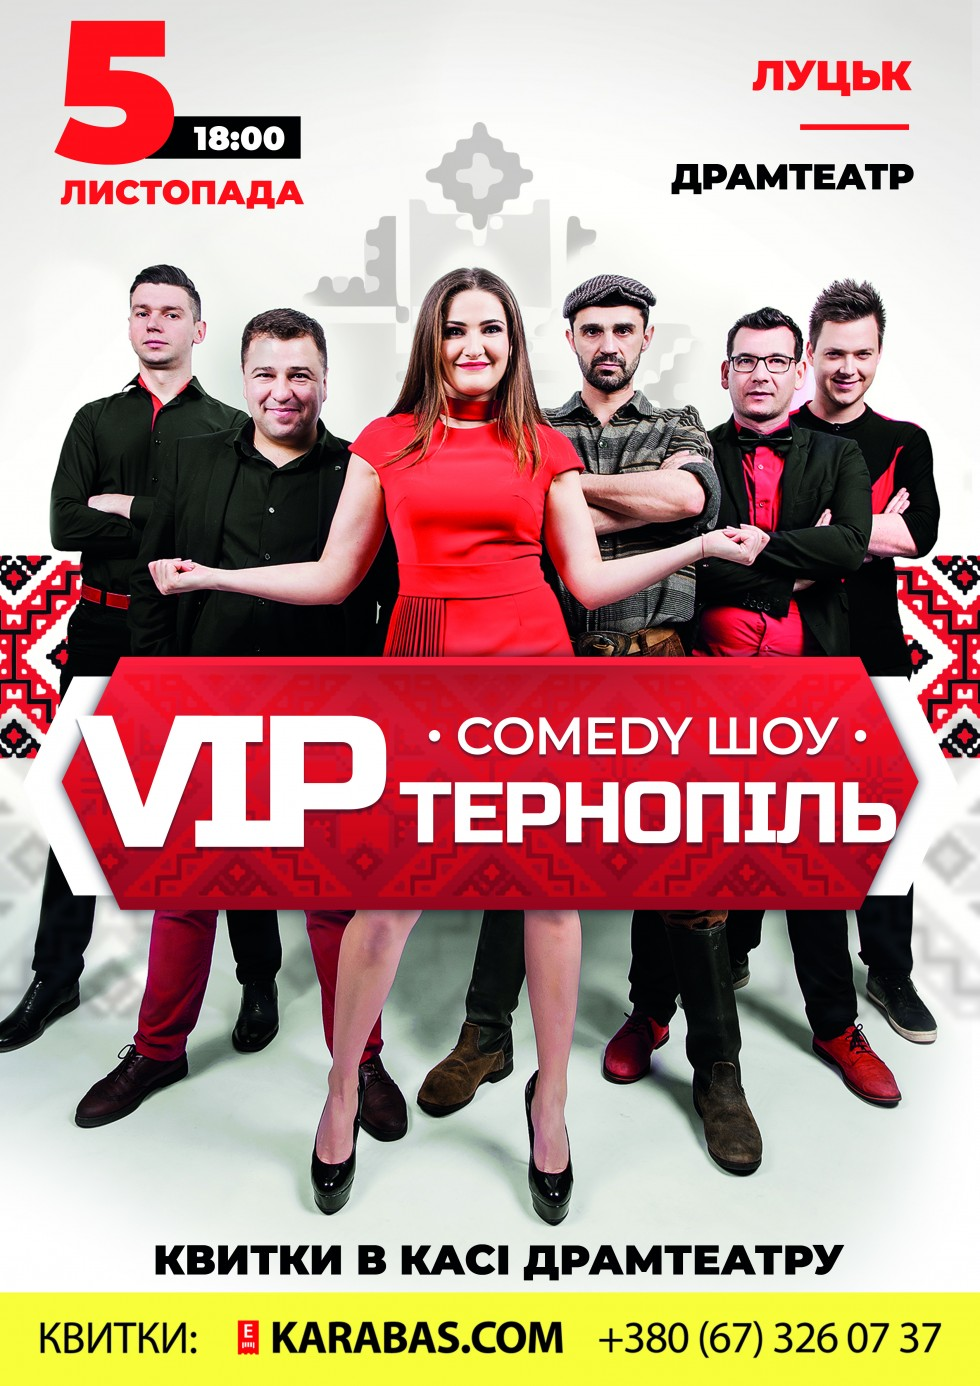 «VIP Тернопіль Comedy Шоу»